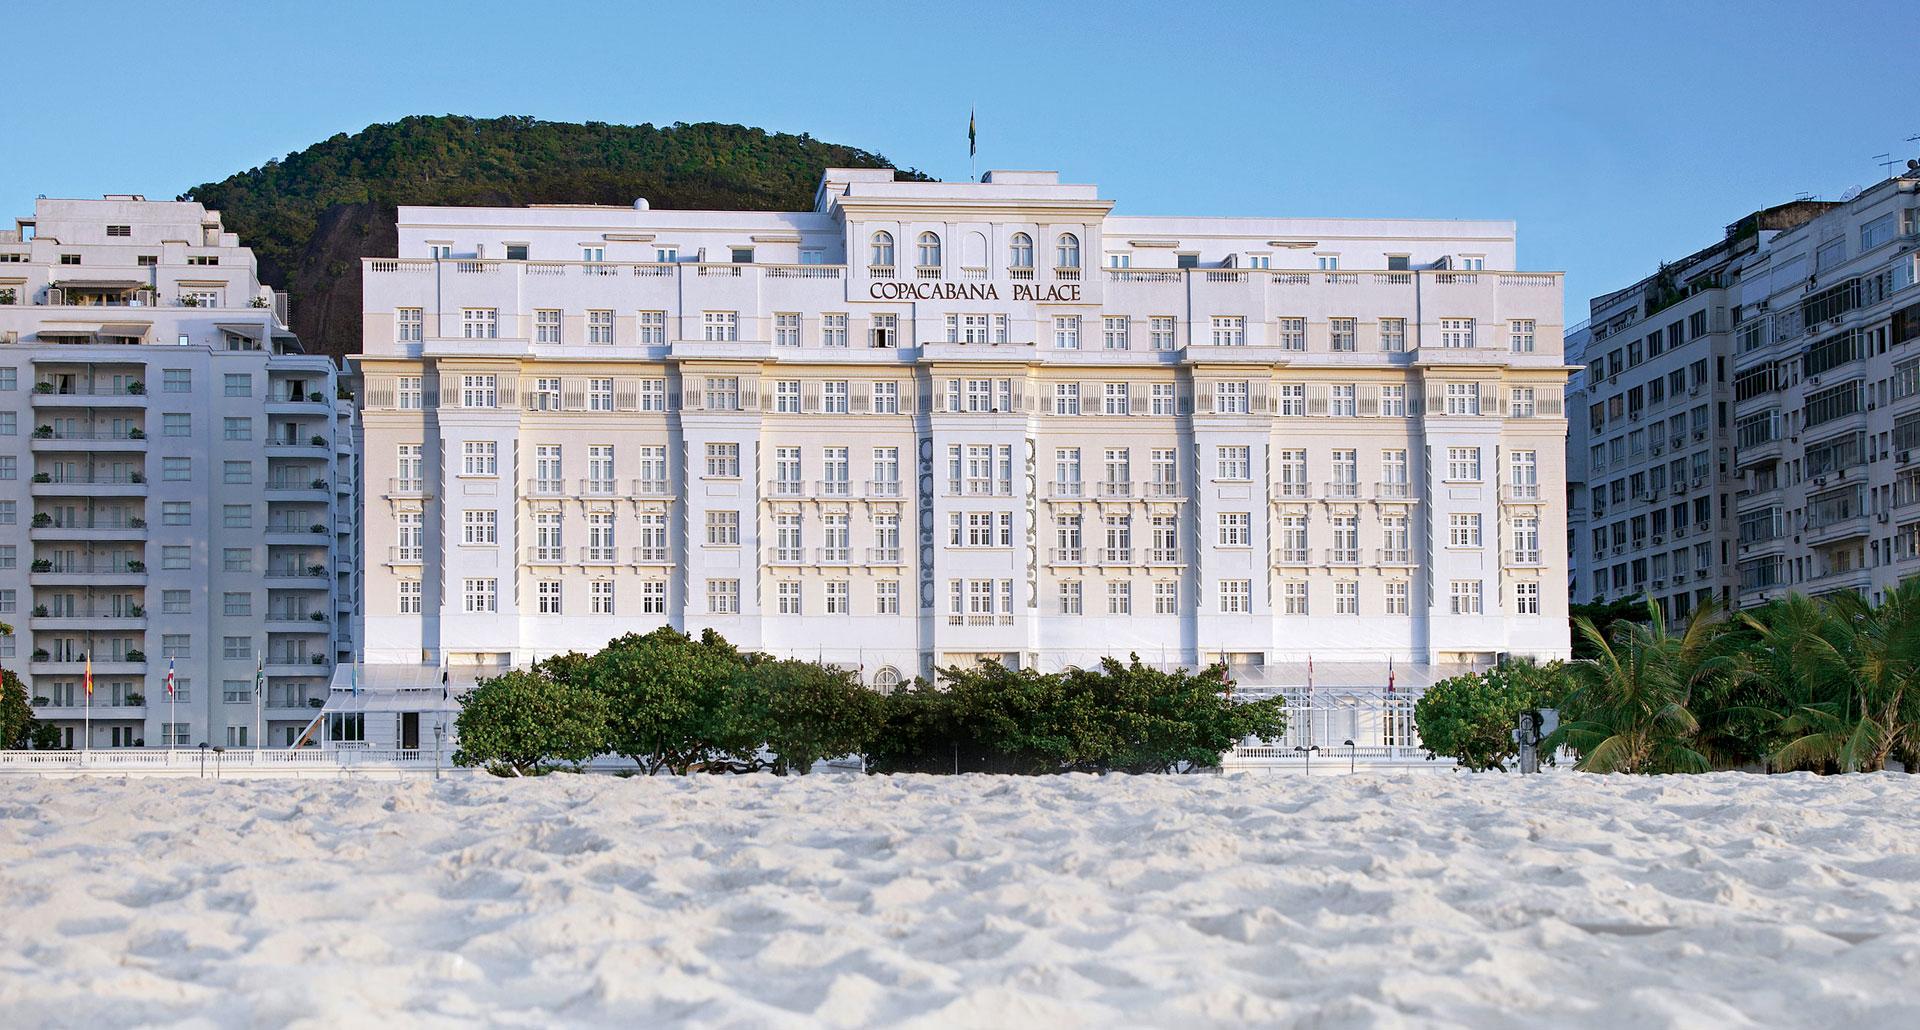 Belmond Copacabana Palace - boutique hotel in Rio de Janeiro